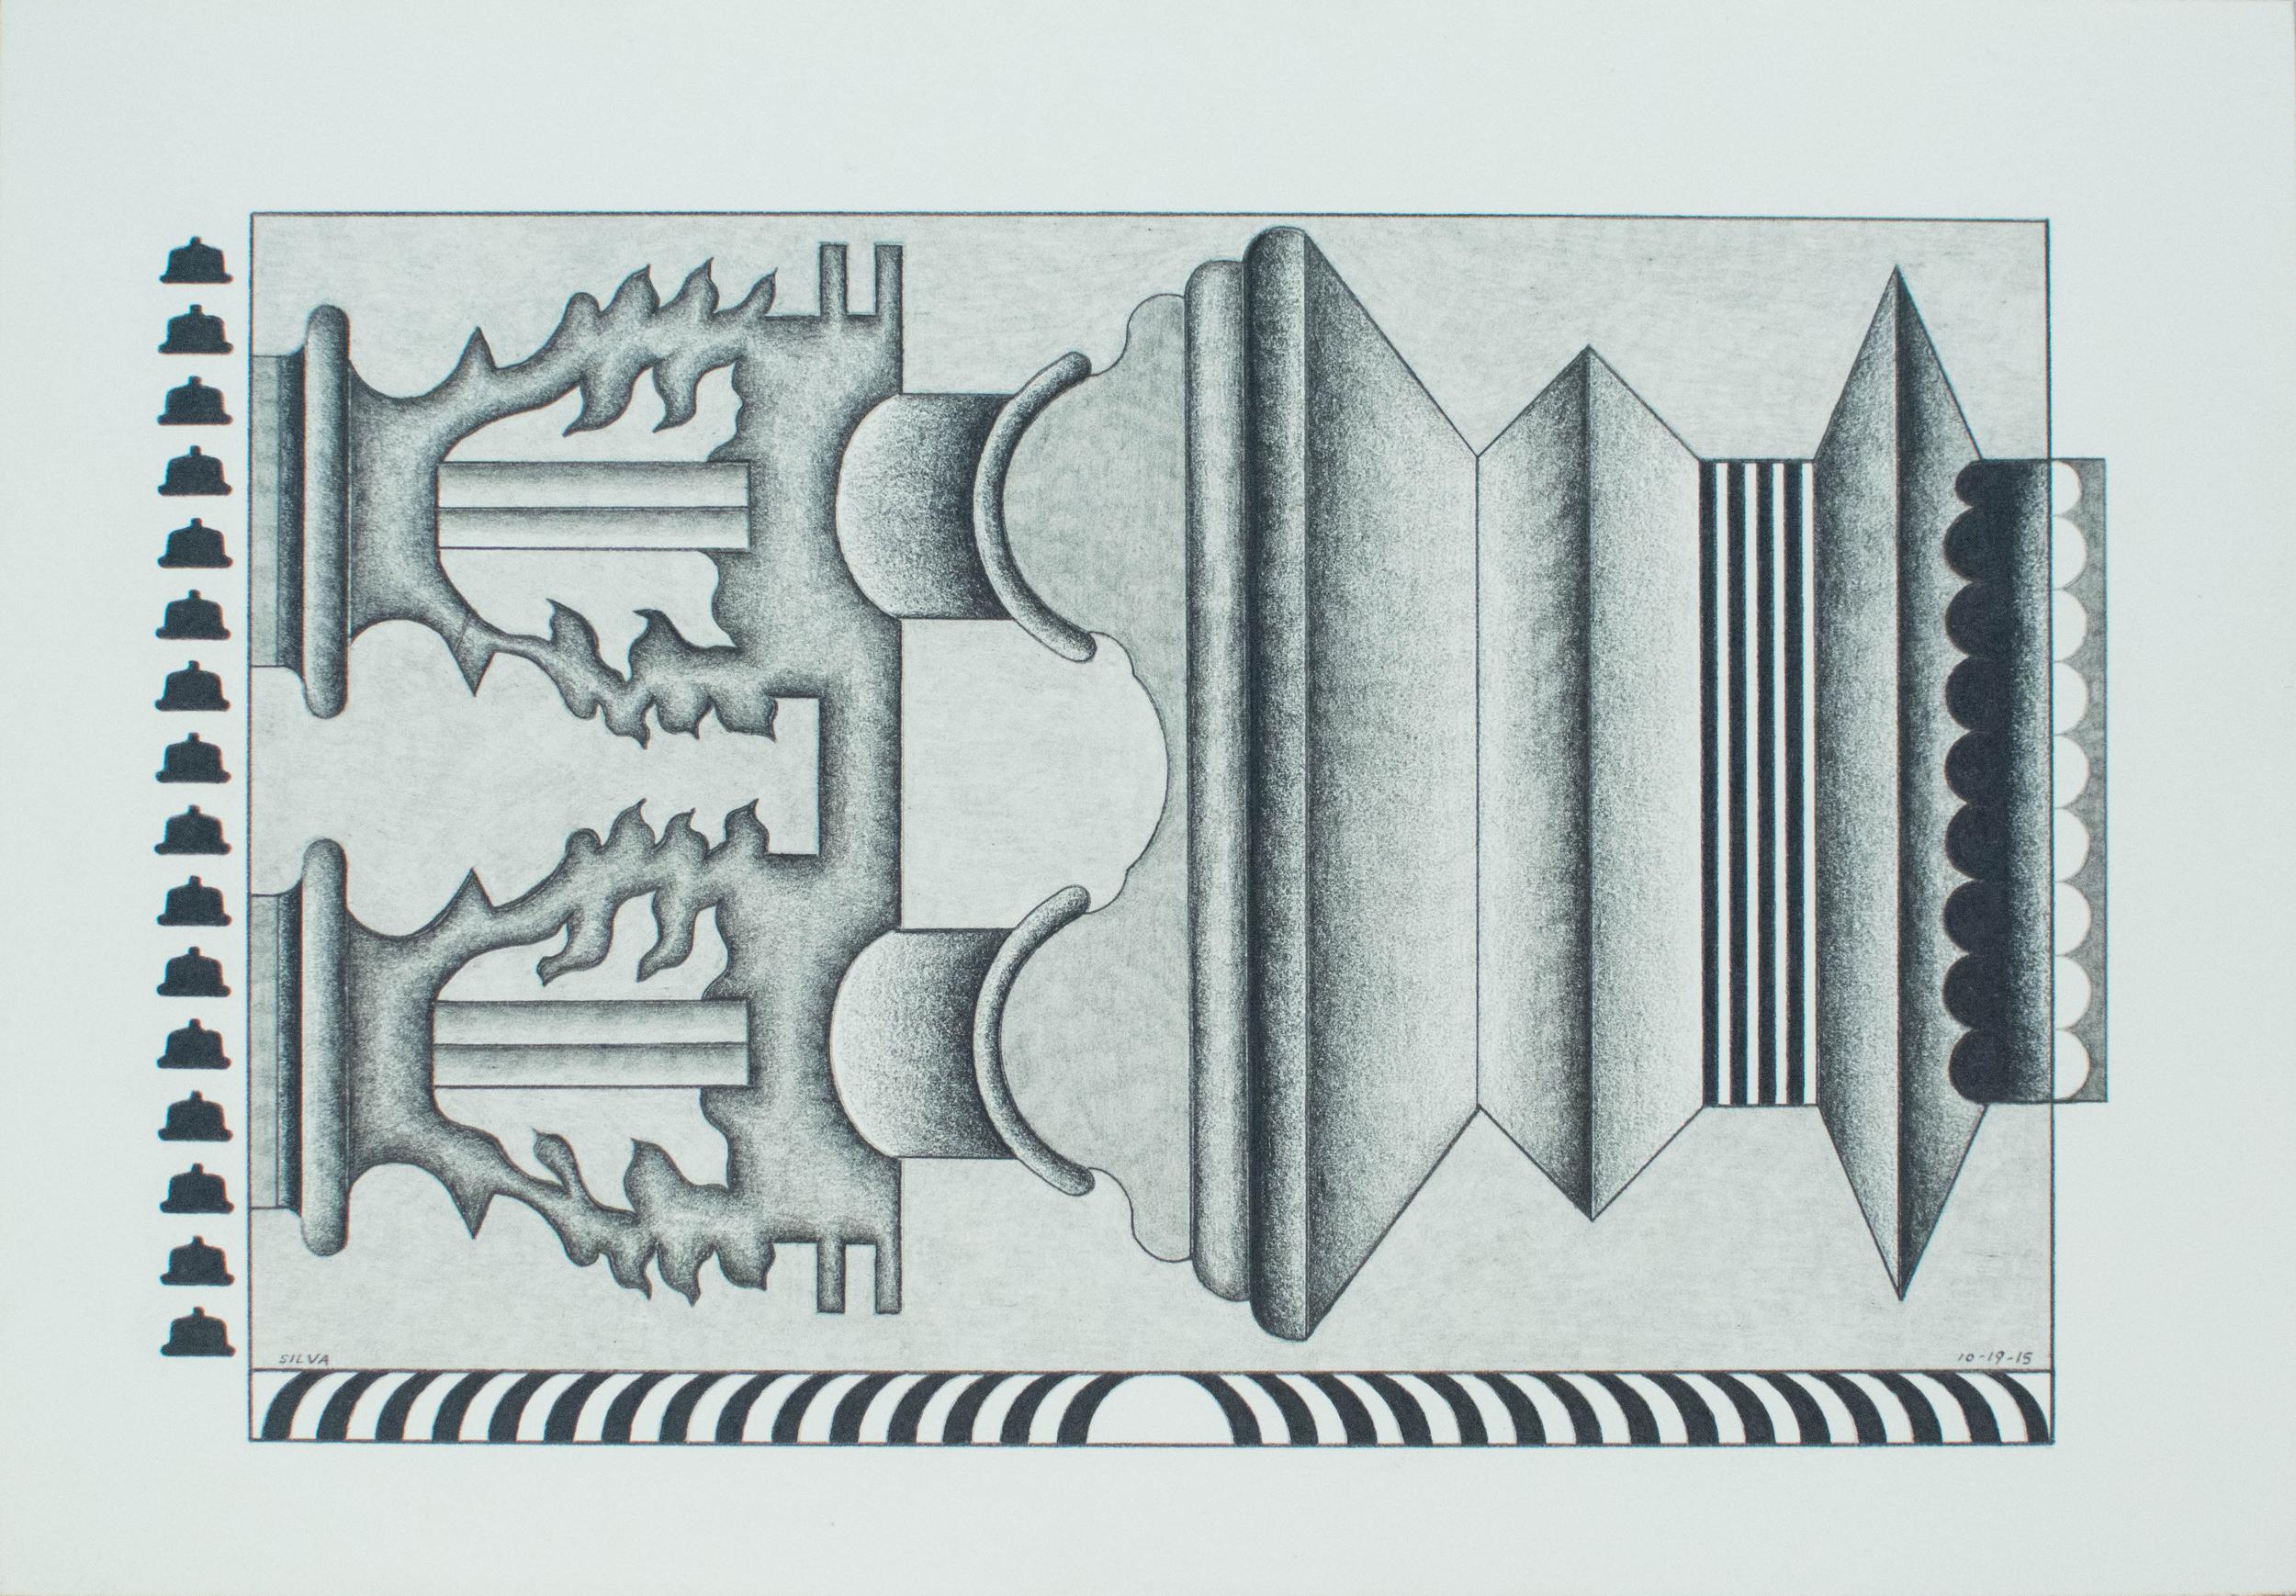 10-19-15, 2015, Graphite on paper, 7 x 10 inches